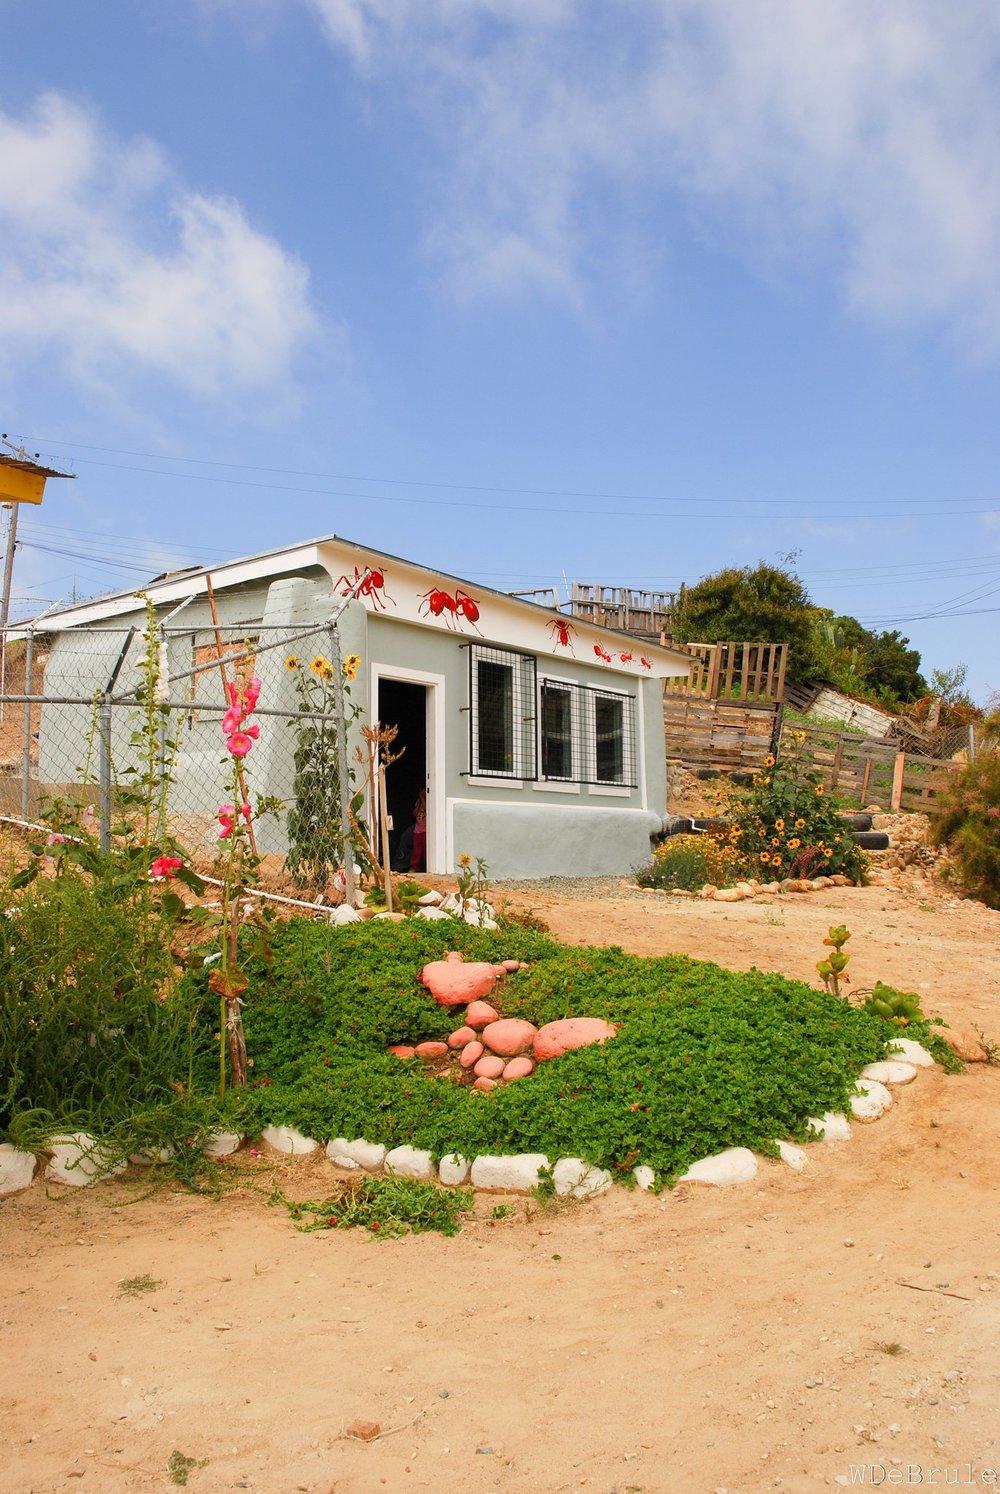 las hormaguitas sustainable architecture 4 walls international trash house tijuana2.jpg